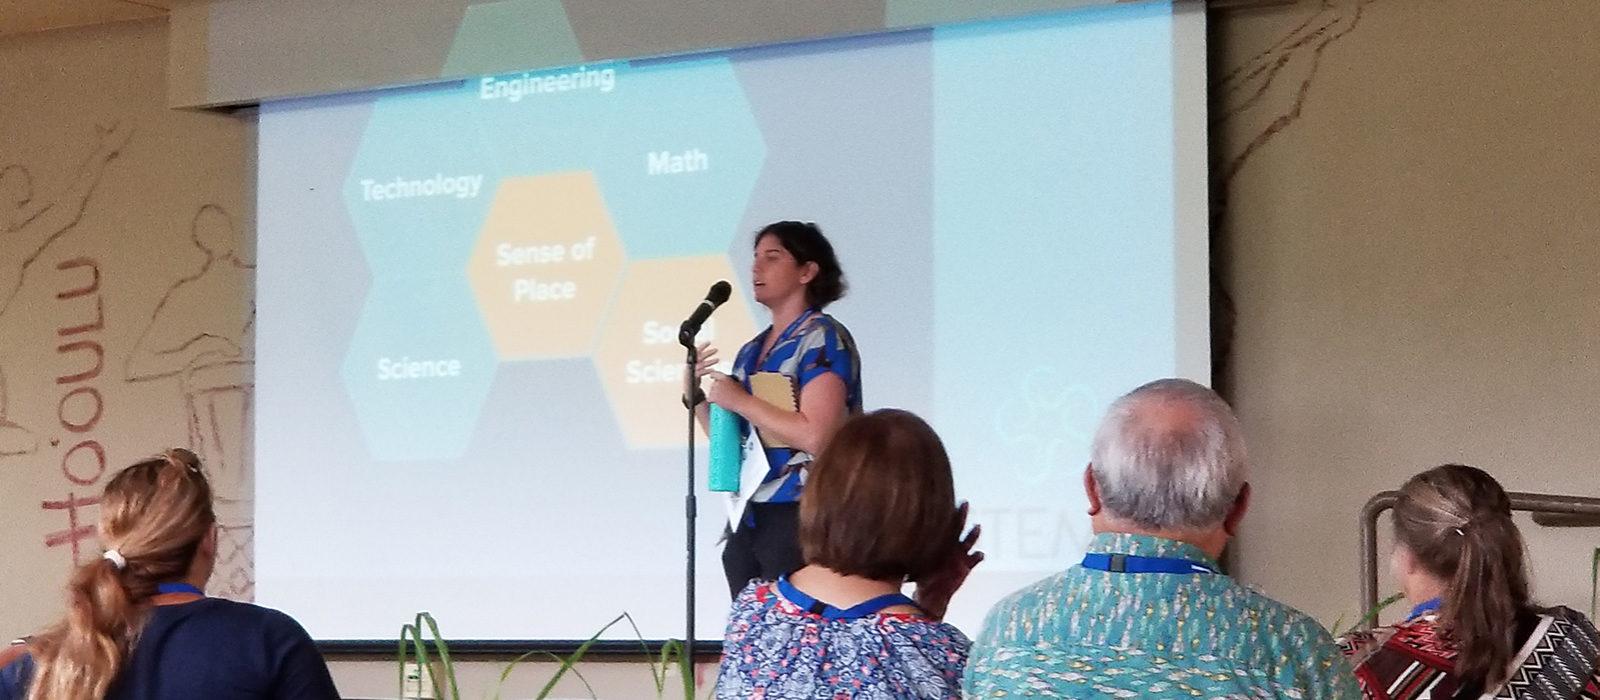 Tara introducing Symposium